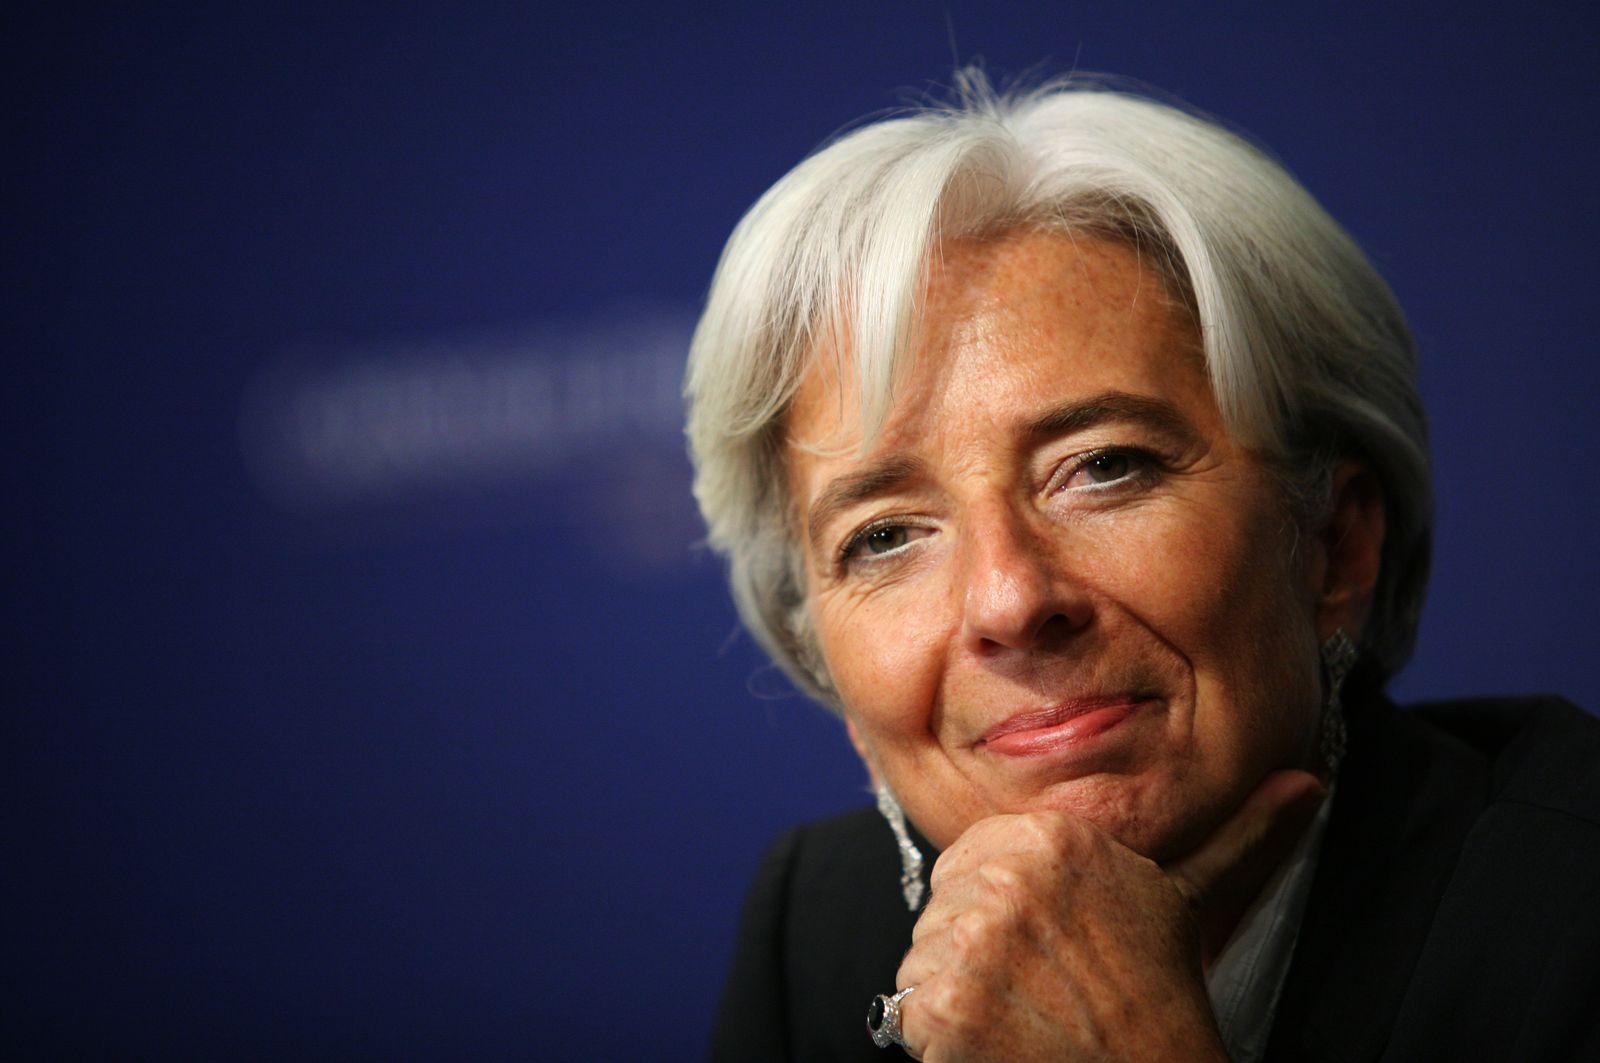 THEMEN Christine Lagarde